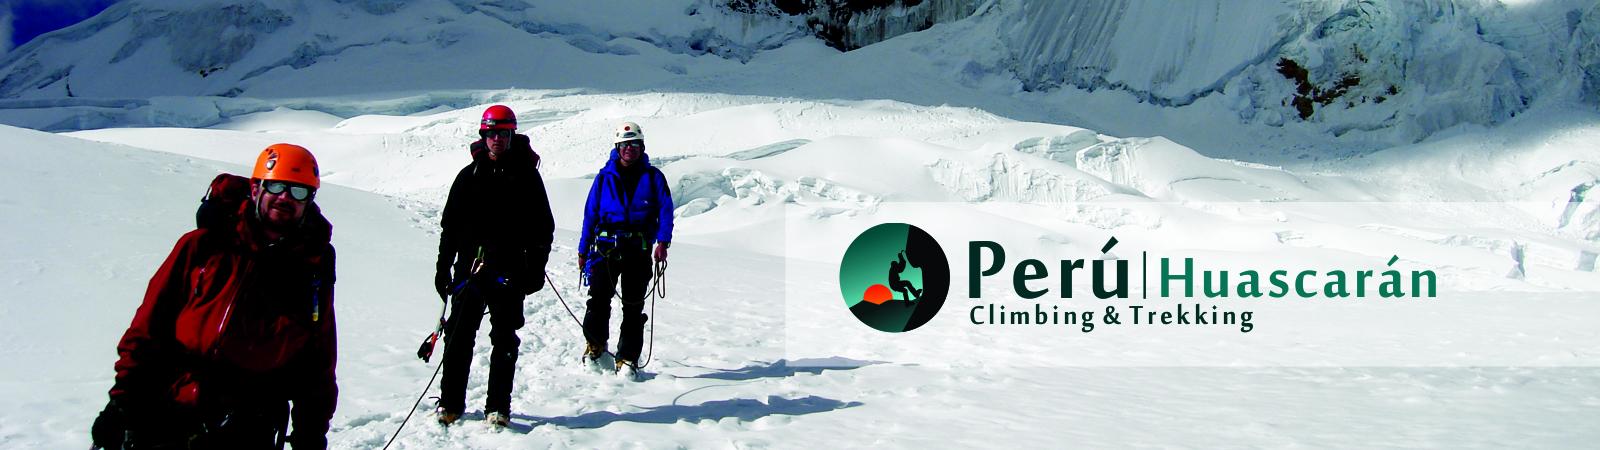 Climbing Perú